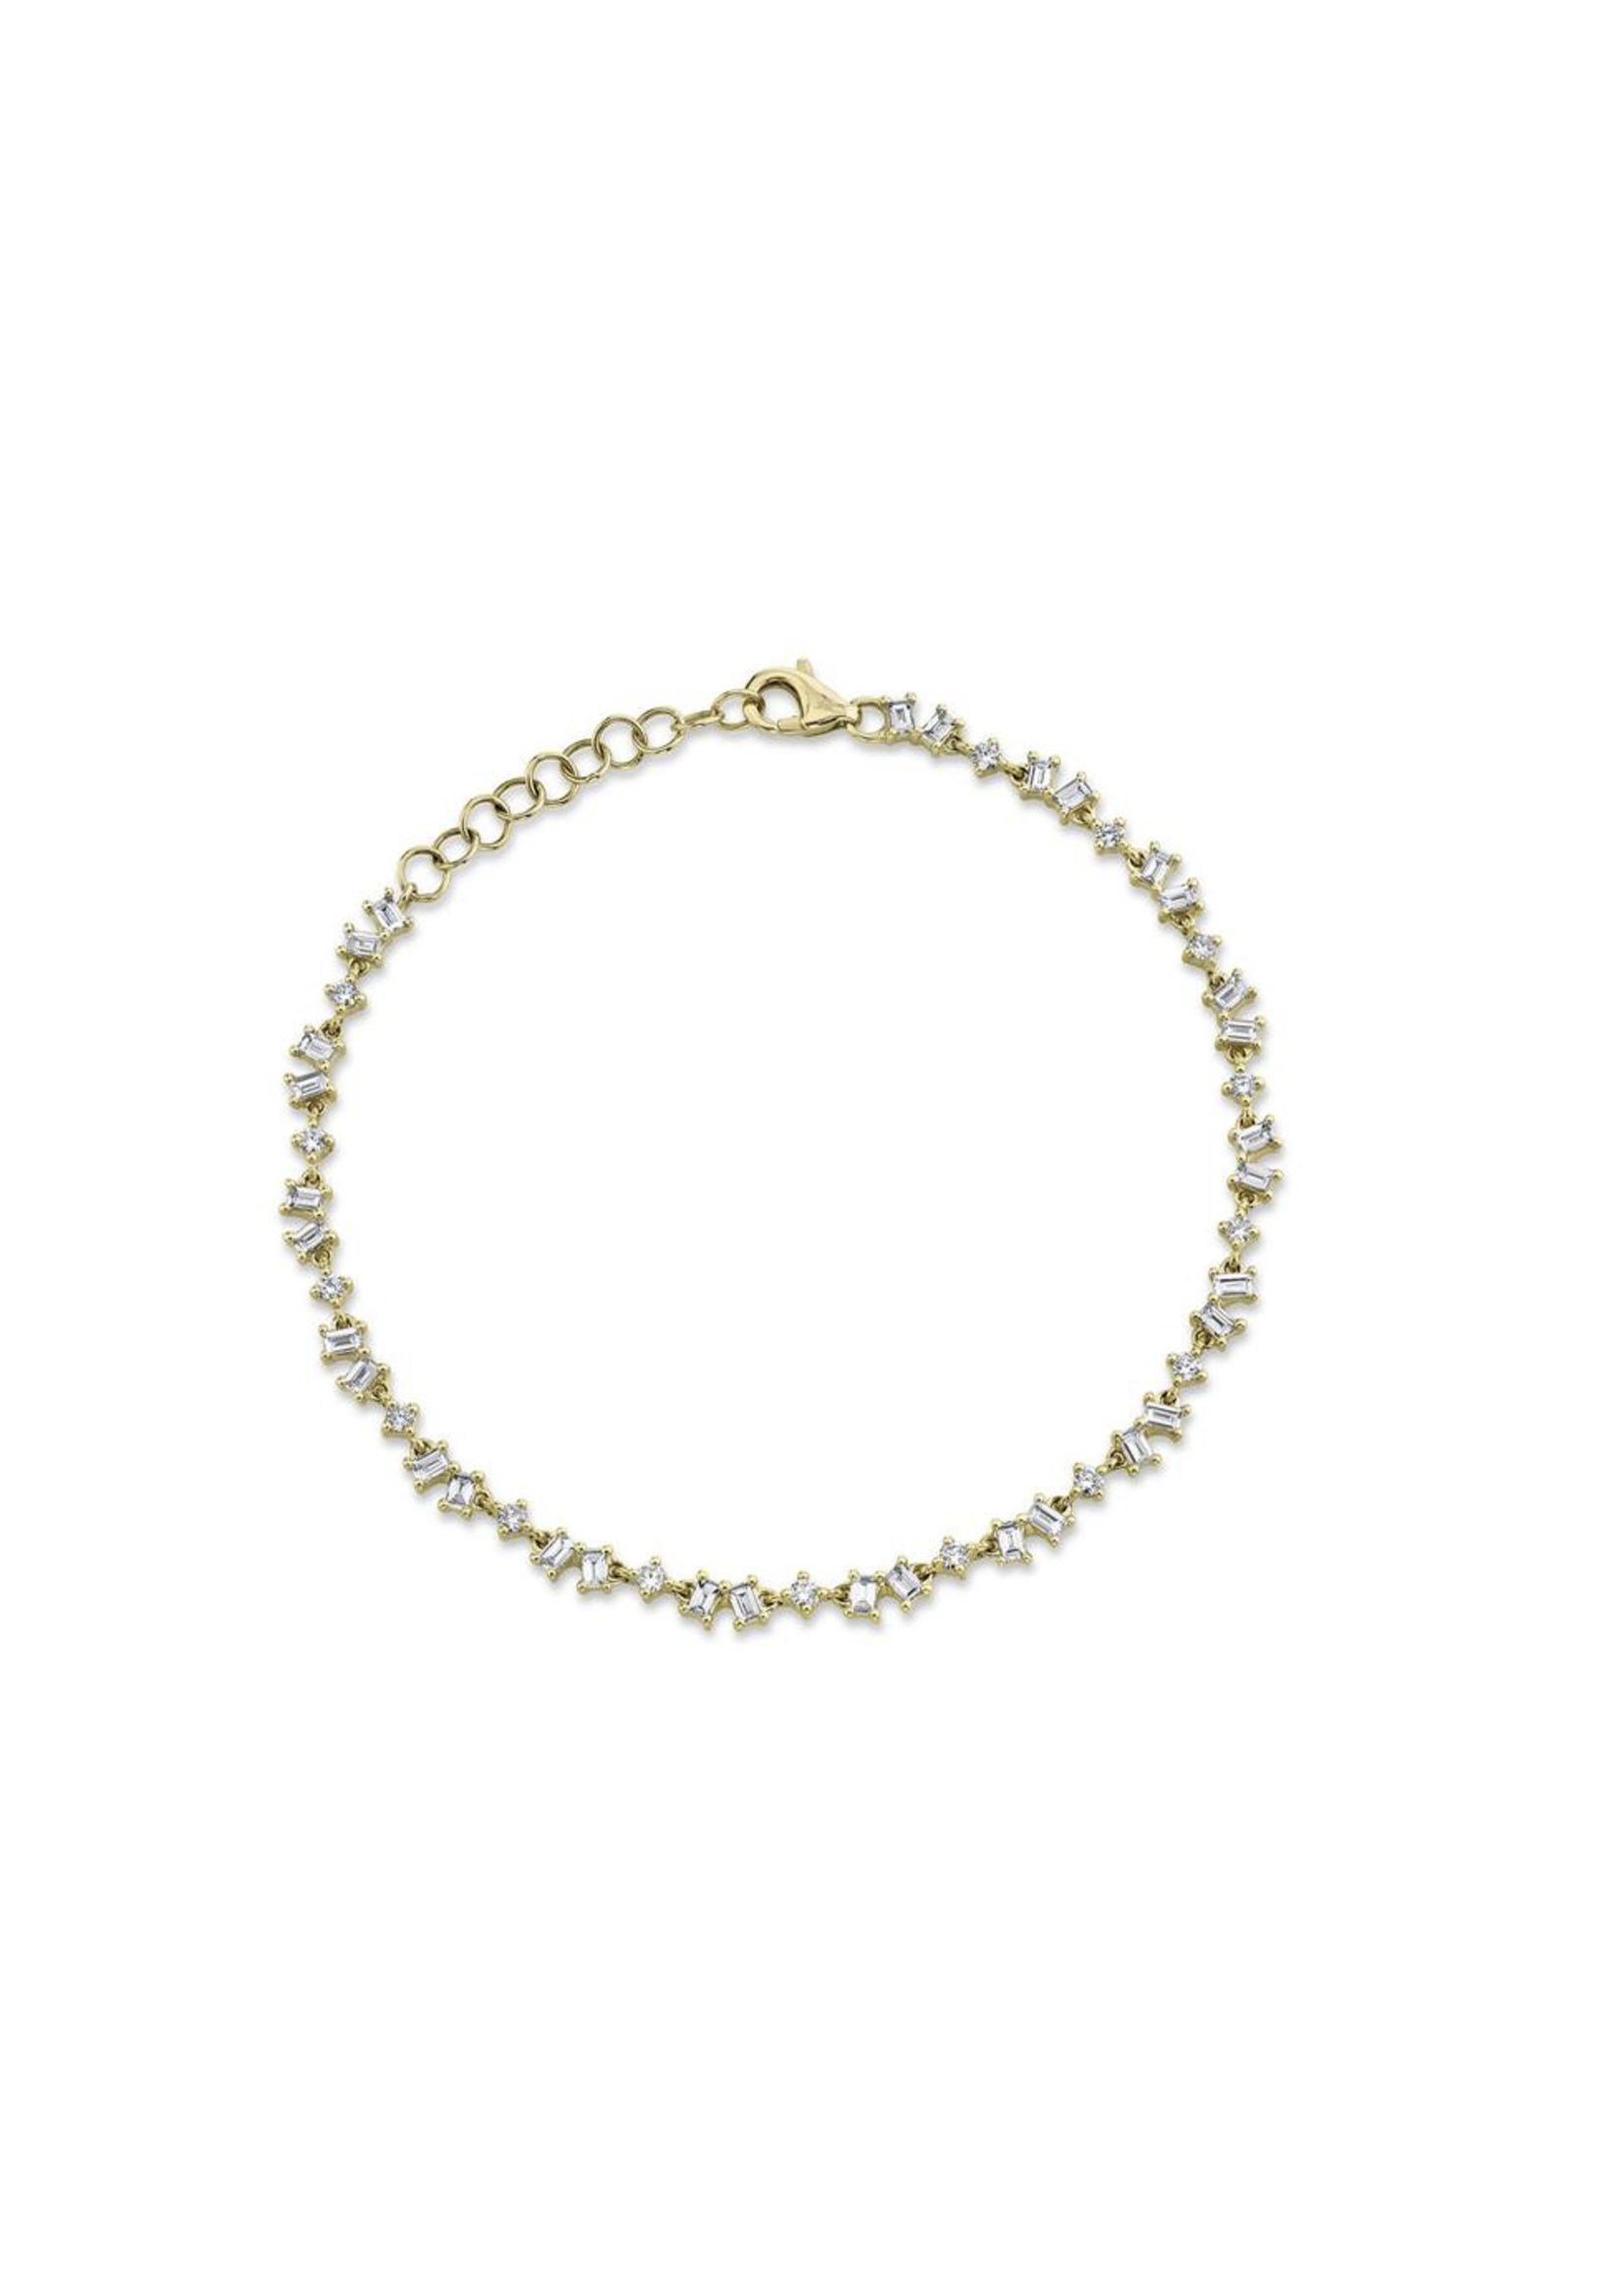 Jill Alberts Diamond Baguette Bracelet